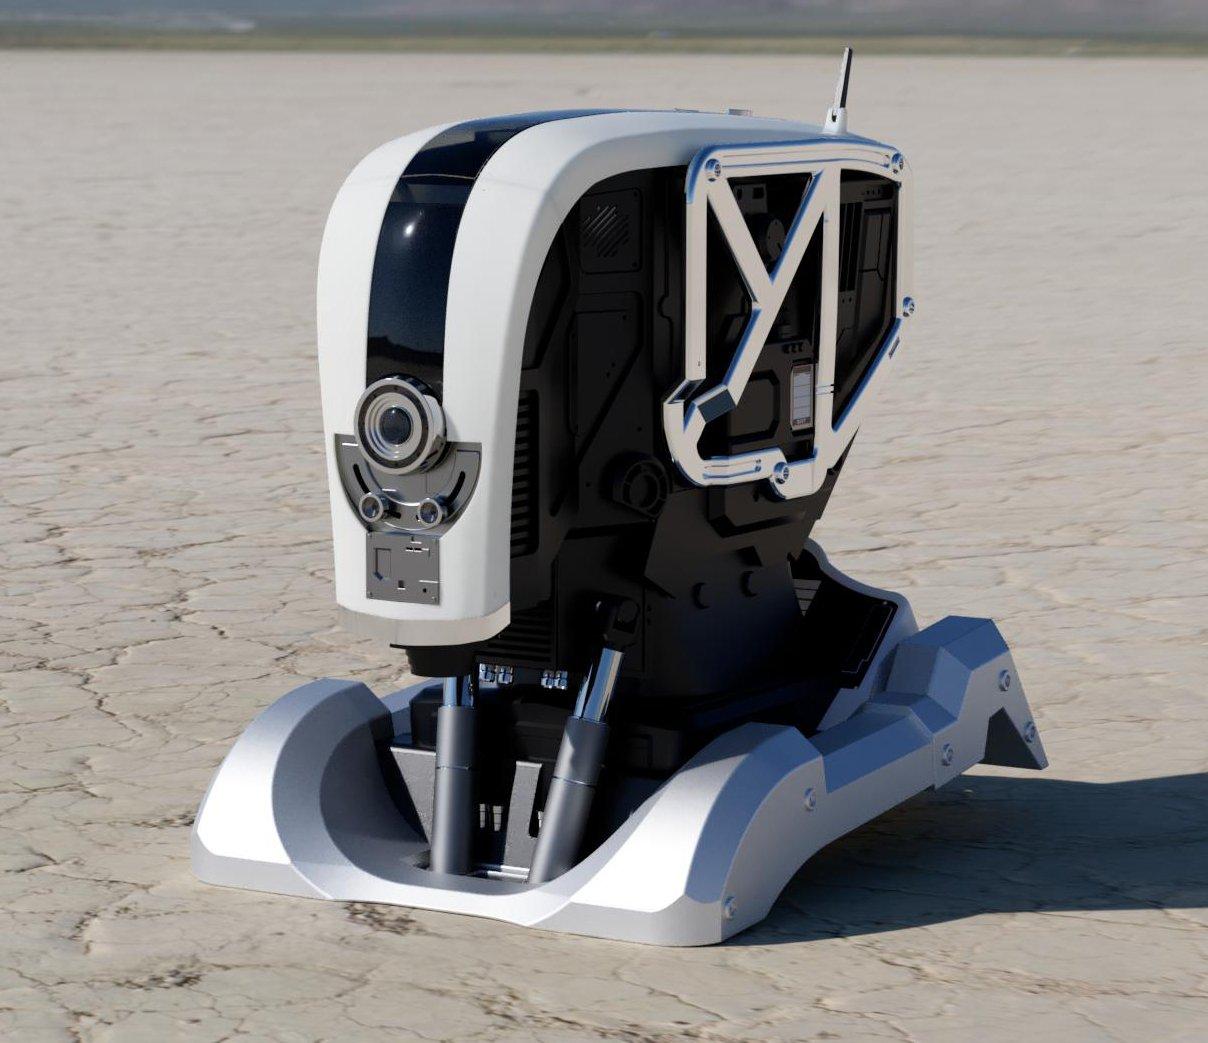 Carlz i am mother Version 2.0 Robot